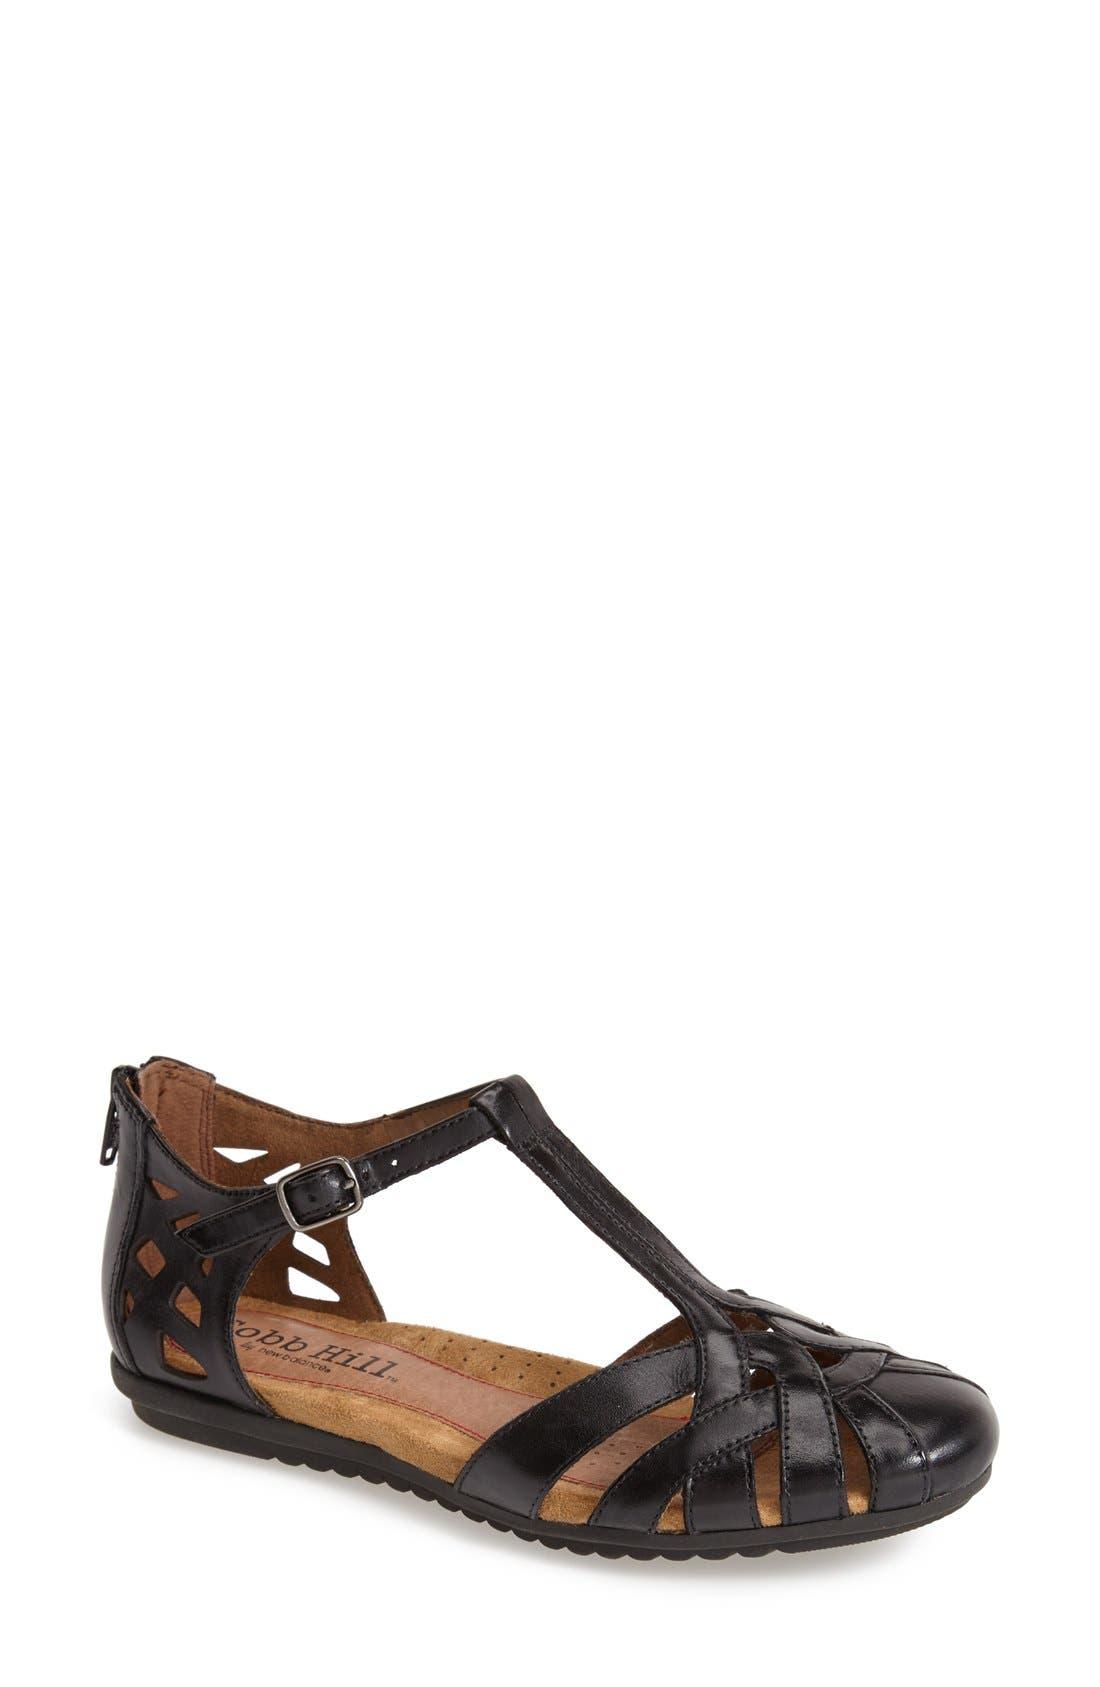 Main Image - Rockport Cobb Hill 'Ireland' Leather Sandal (Women)